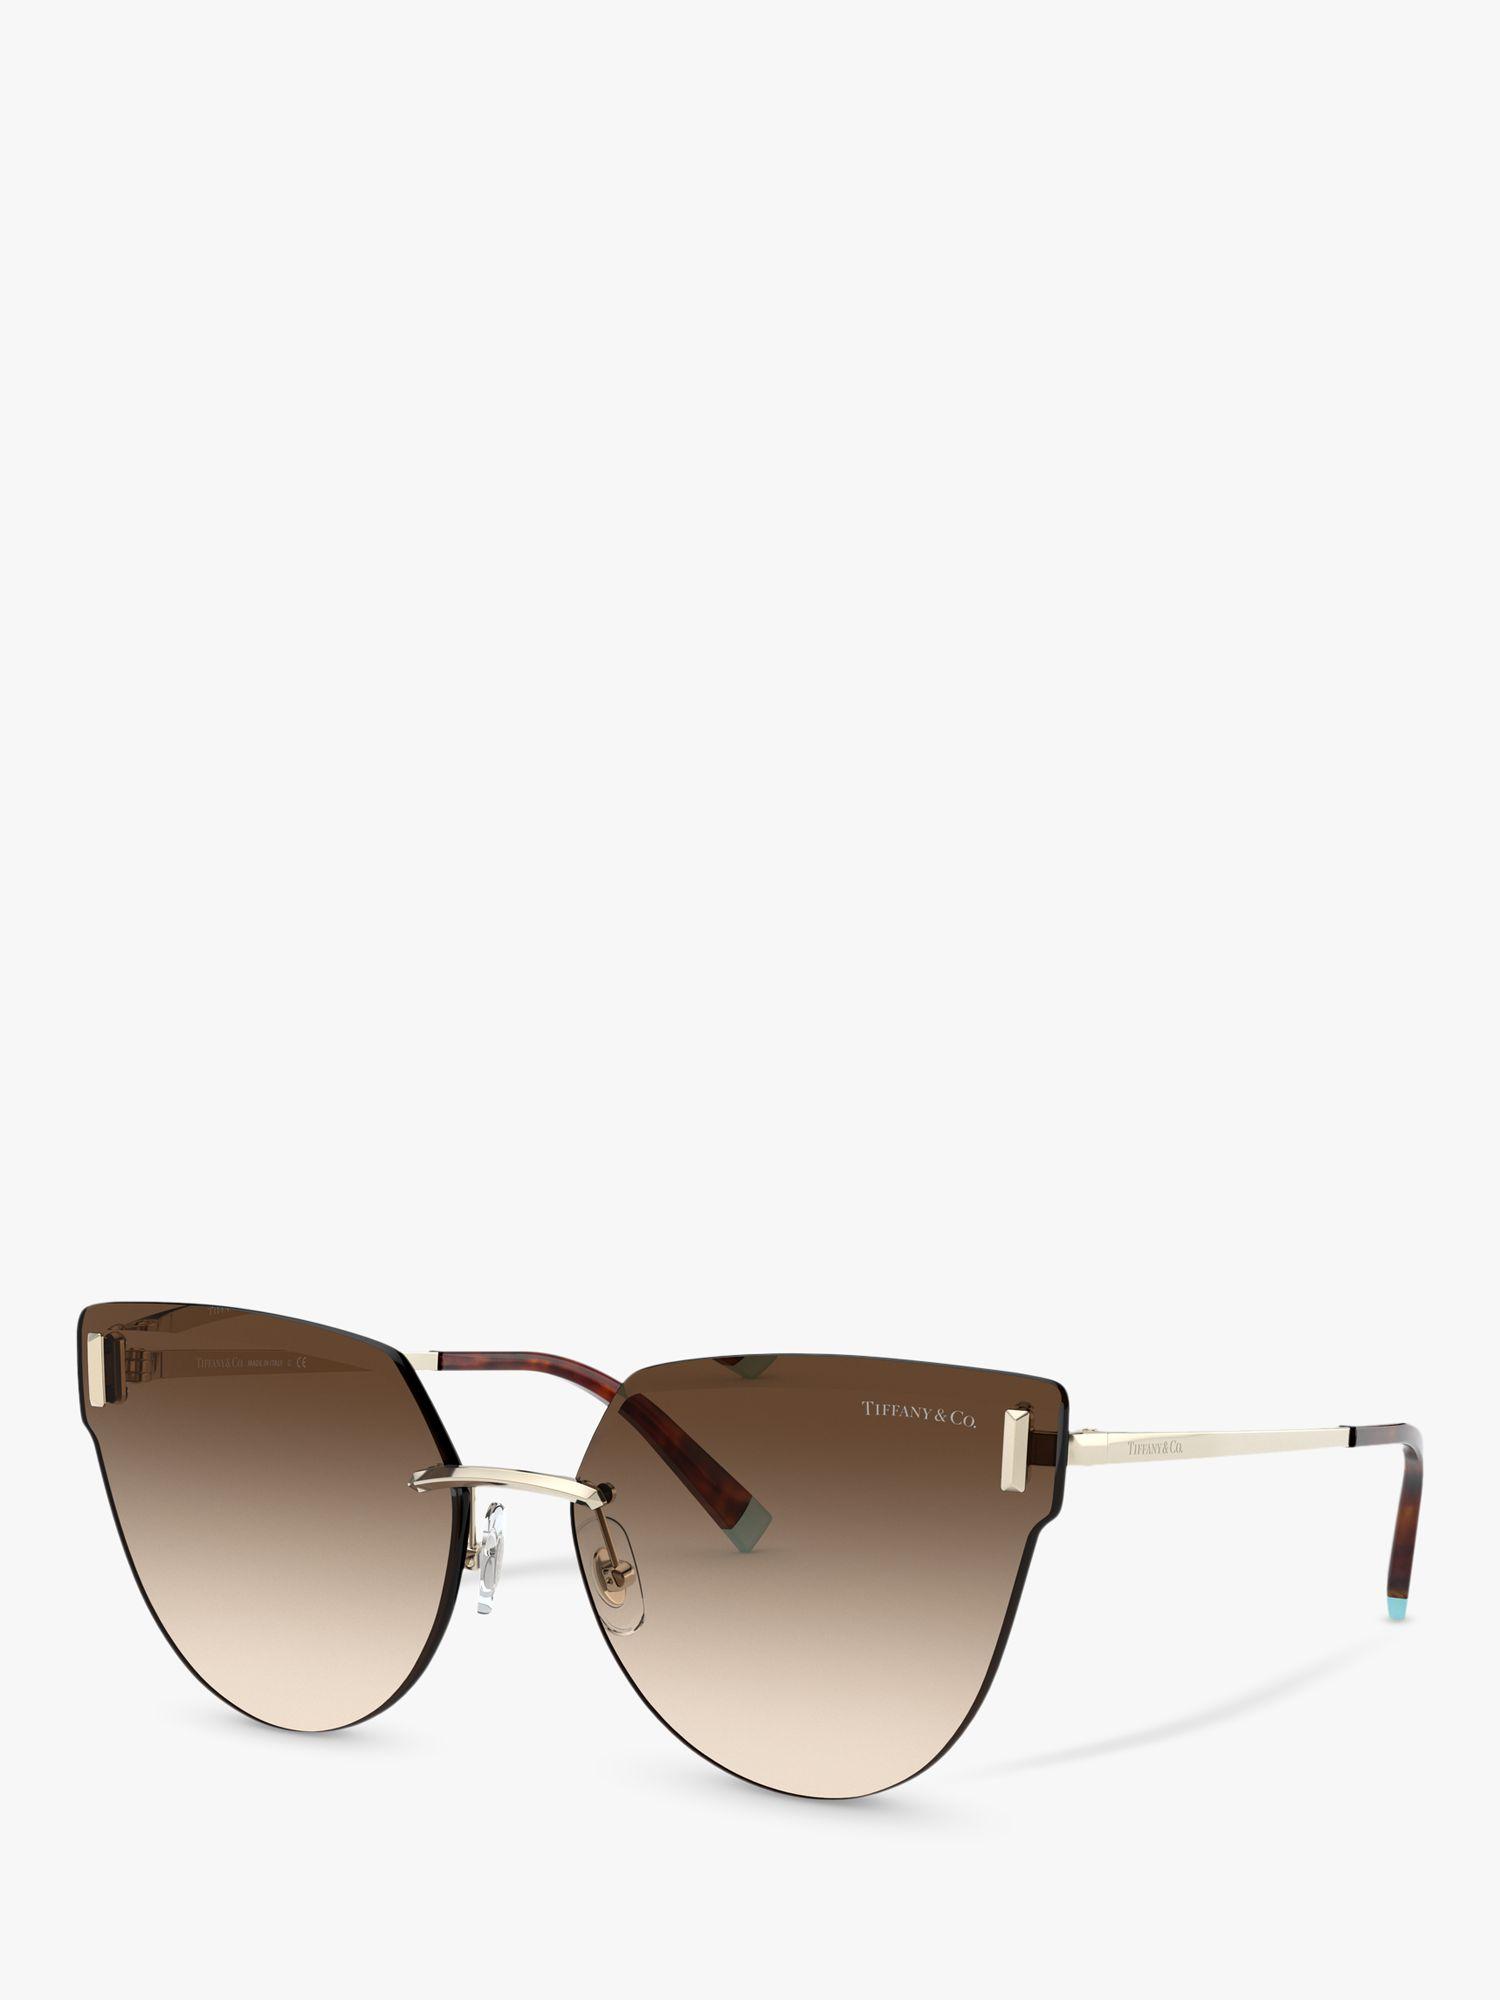 Tiffany & Co Tiffany & Co TF3070 Women's Irregular Sunglasses, Gold/Brown Gradient